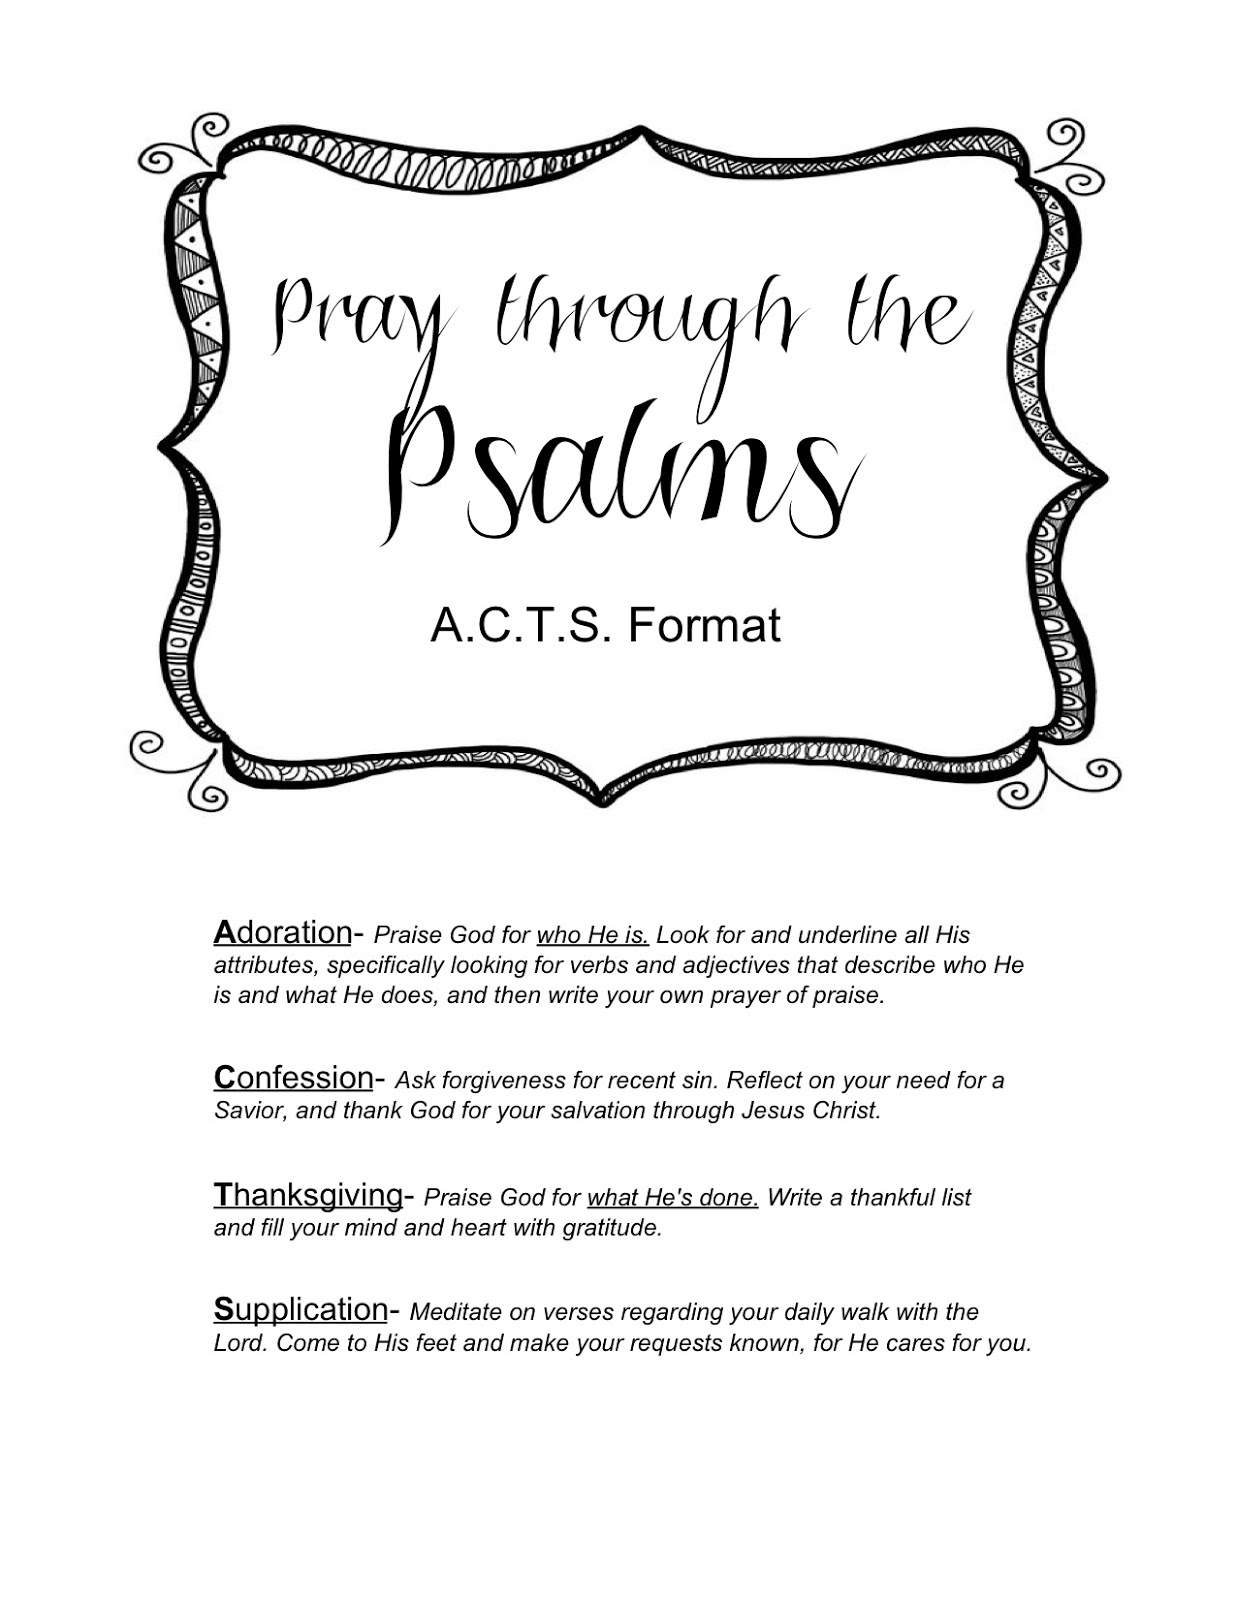 How to write a pray of the faithful